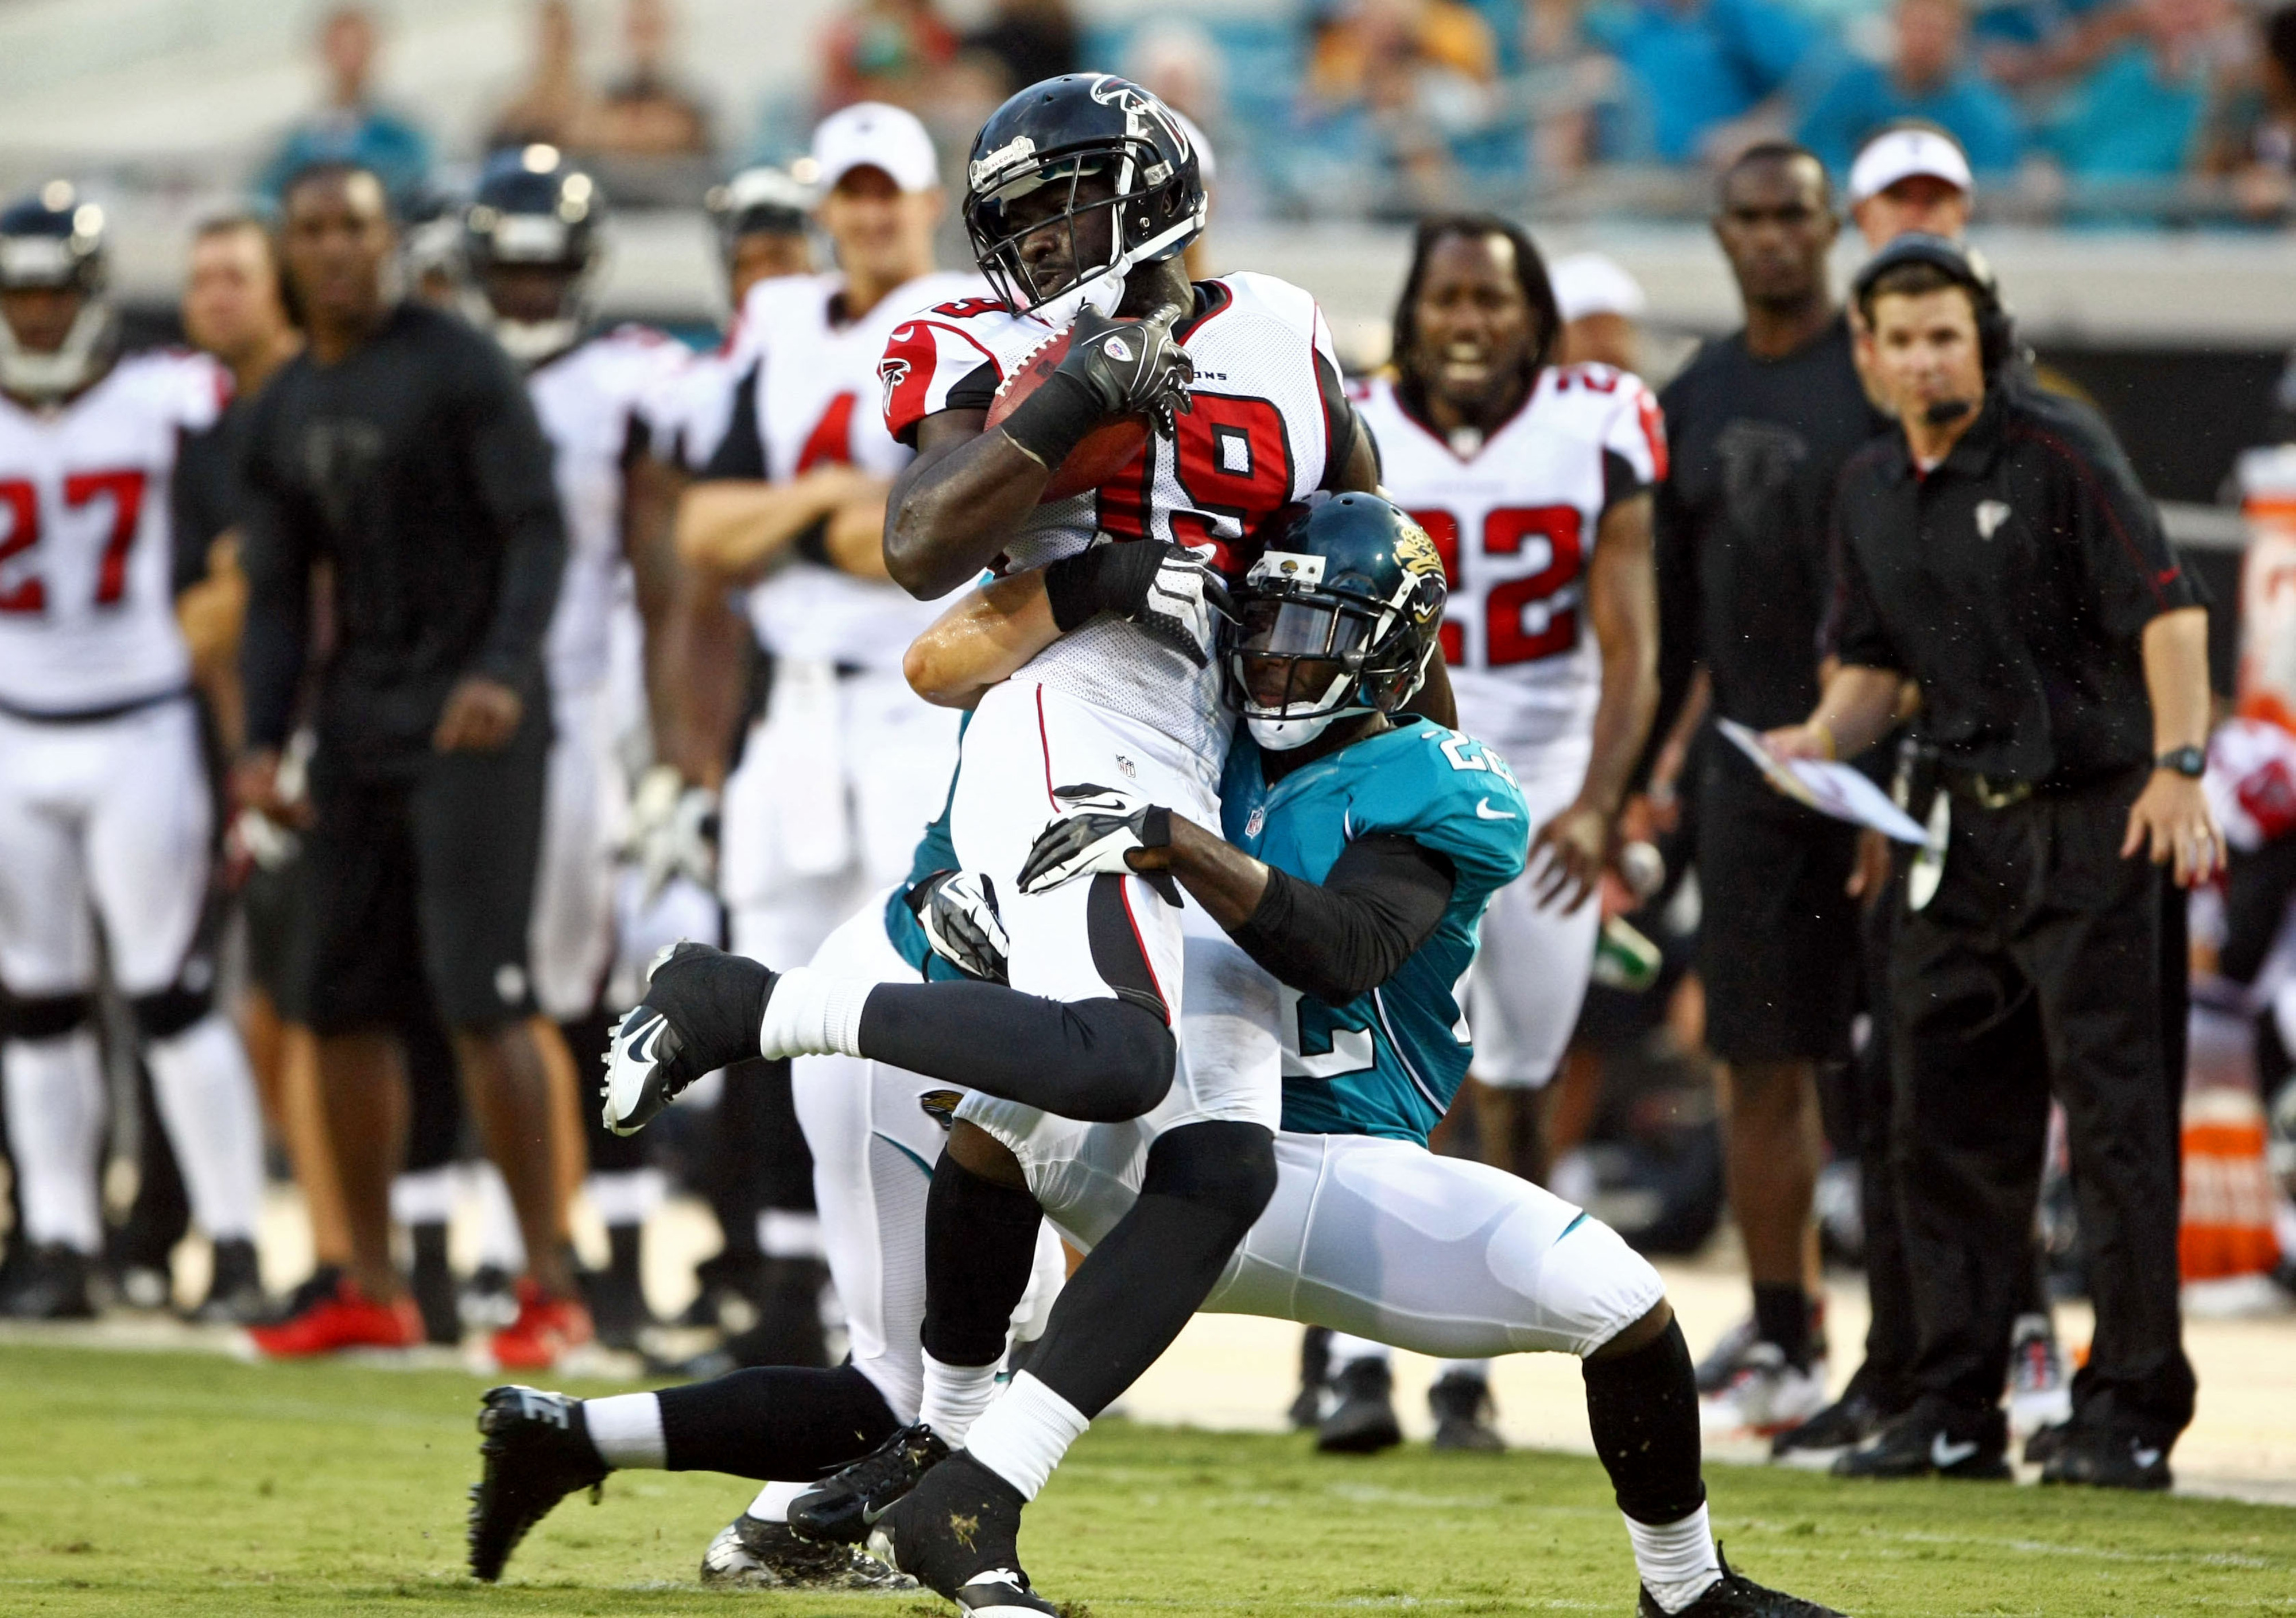 Aug 30, 2012; Jacksonville FL, USA; Jacksonville Jaguars cornerback Kevin Rutland (22) tackles Atlanta Falcons wide receiver D.J. Davis (19) after a reception during the second quarter at EverBank Field. Mandatory Credit: Douglas Jones-US PRESSWIRE